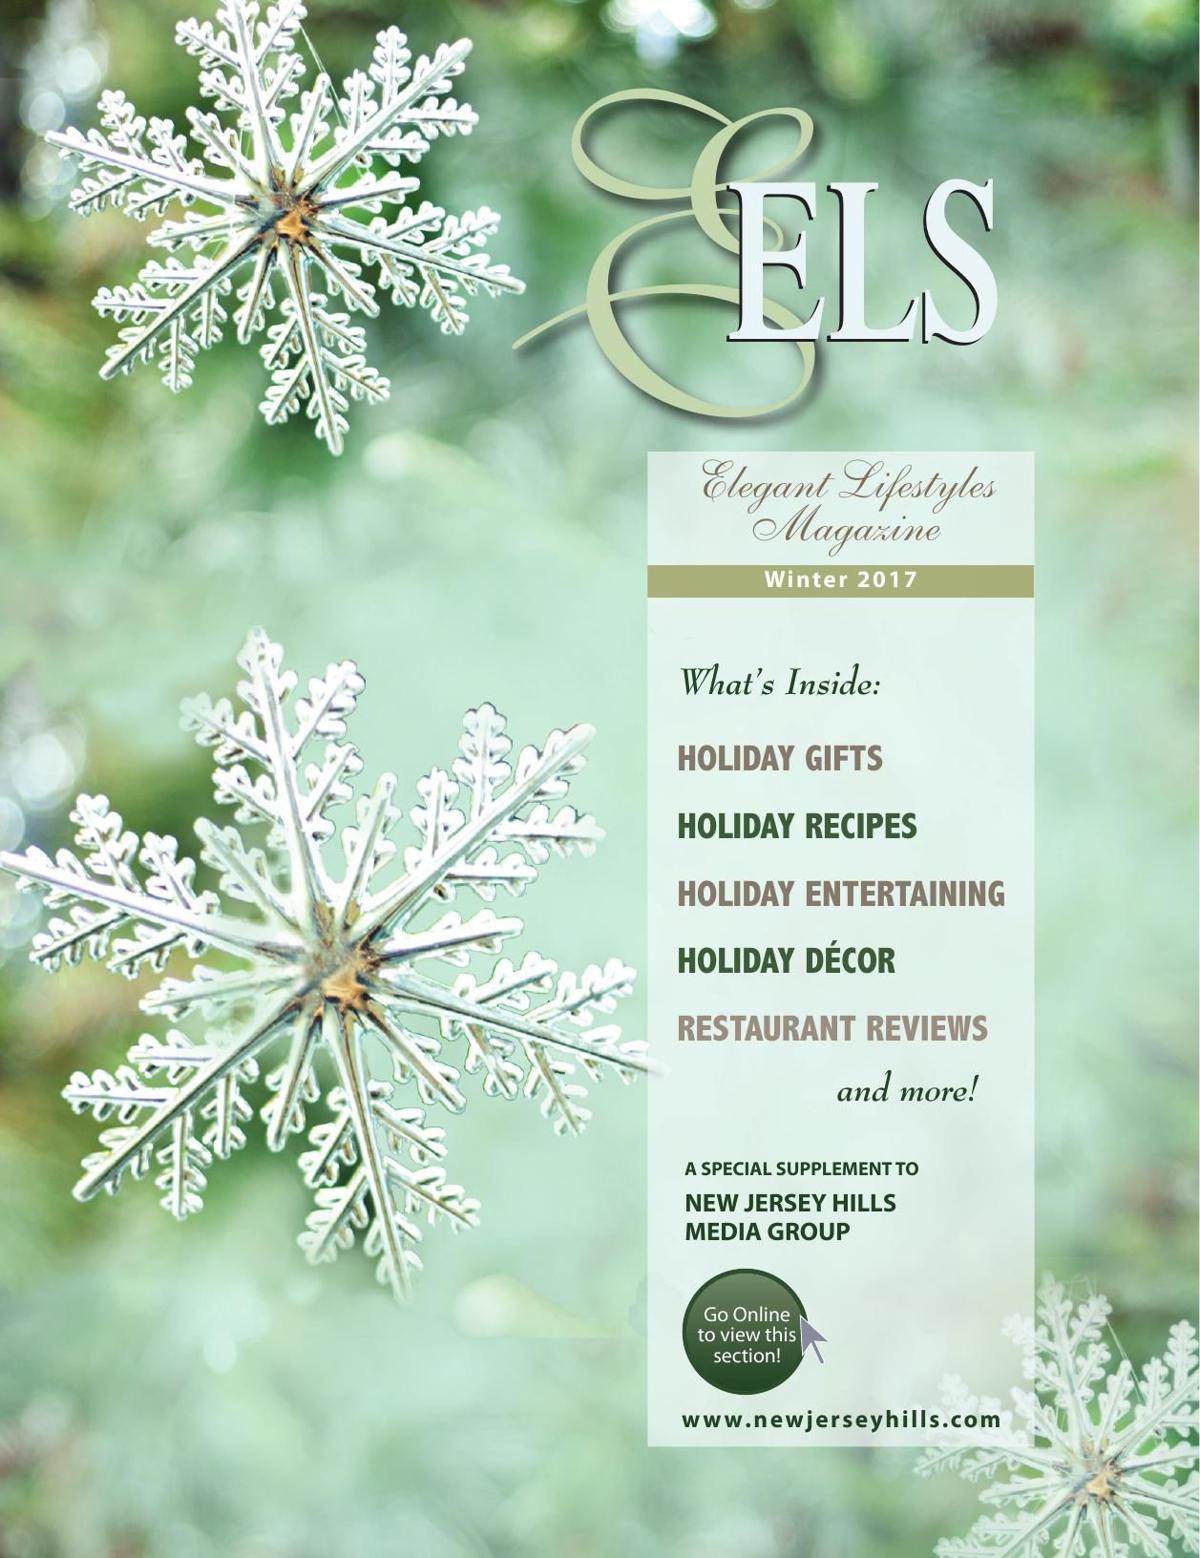 Elegant Lifestyles Magazine - December 2017